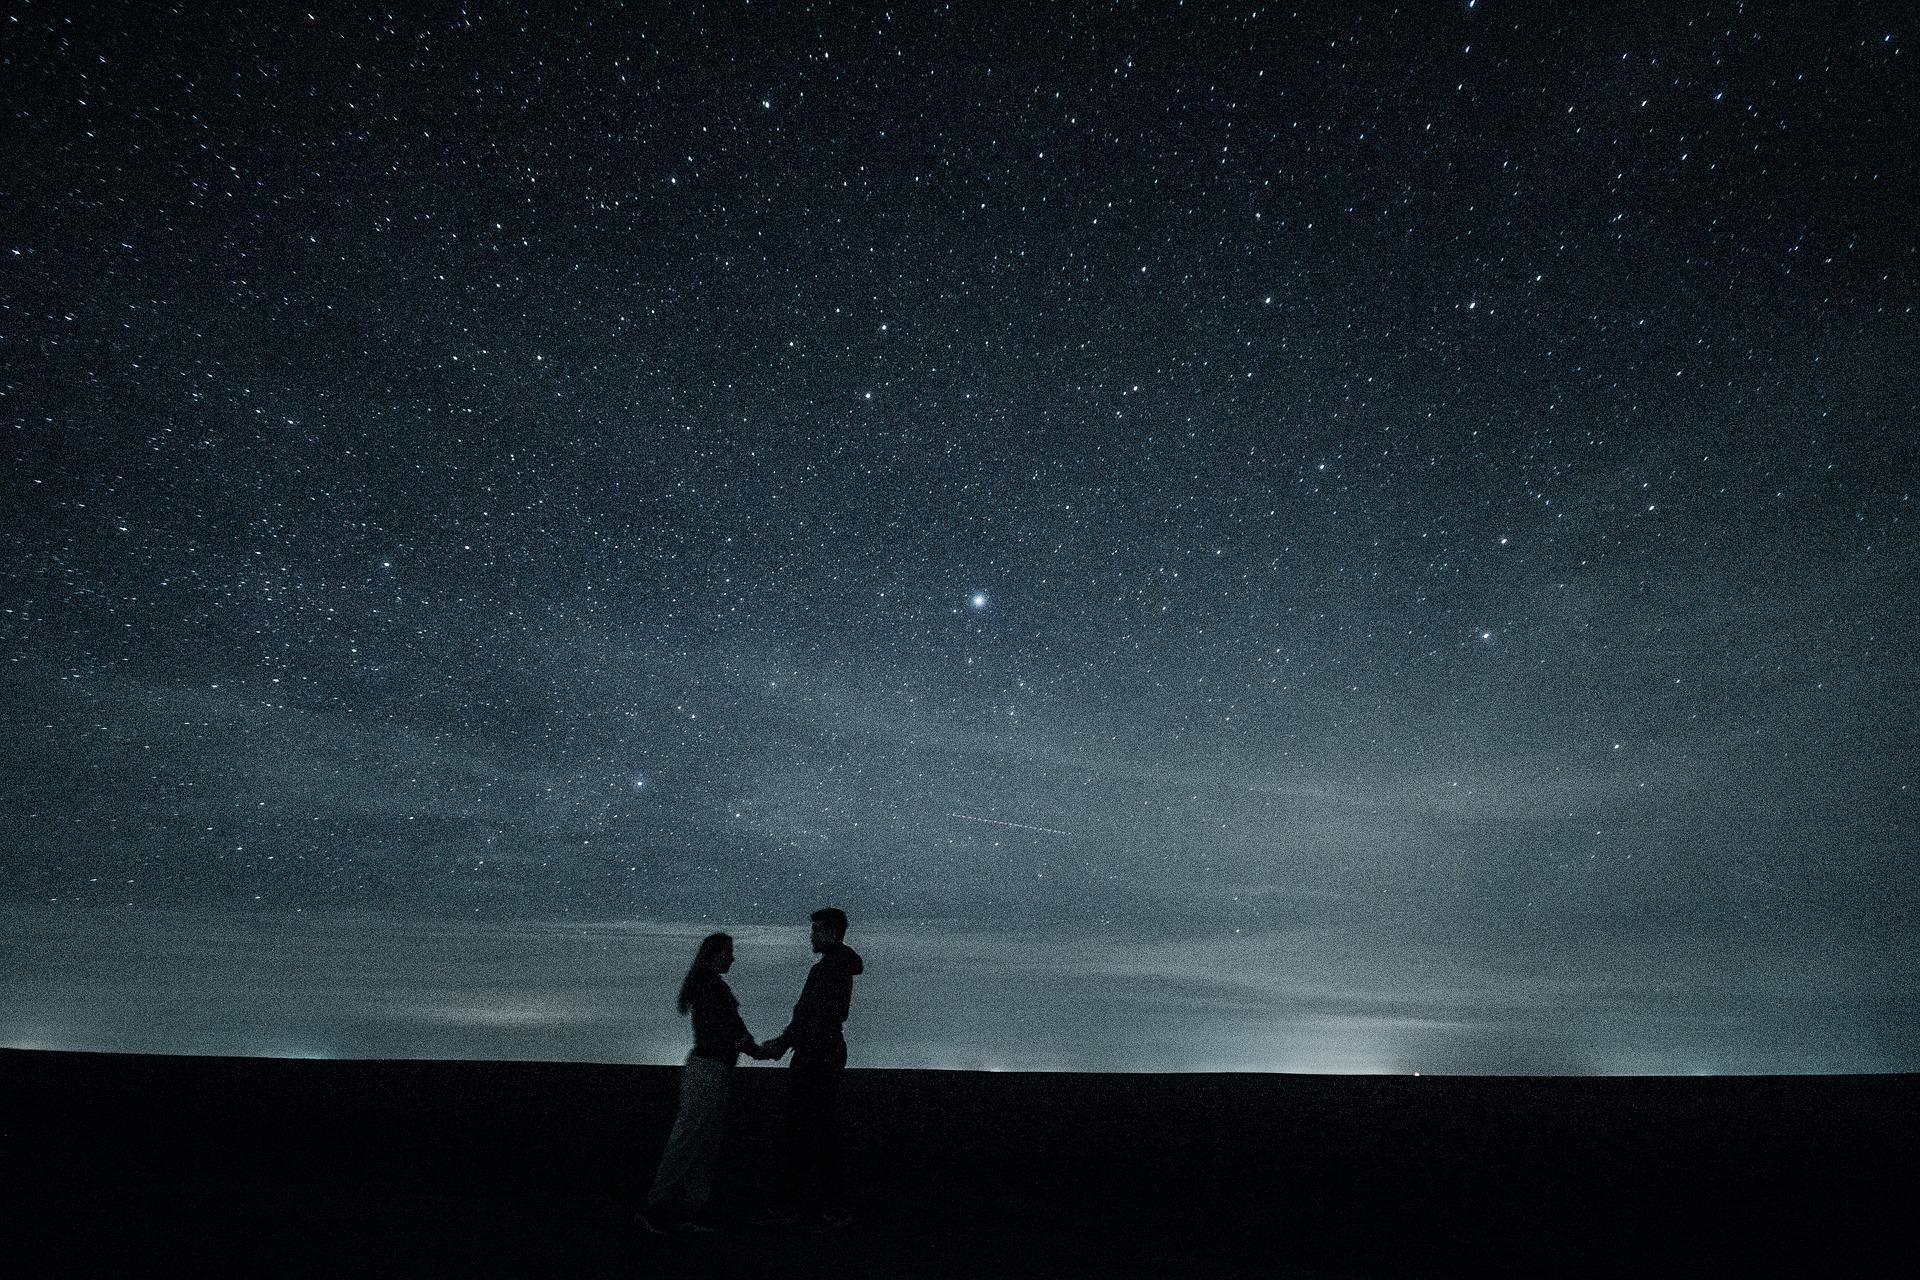 couple-1375125_1920.jpg